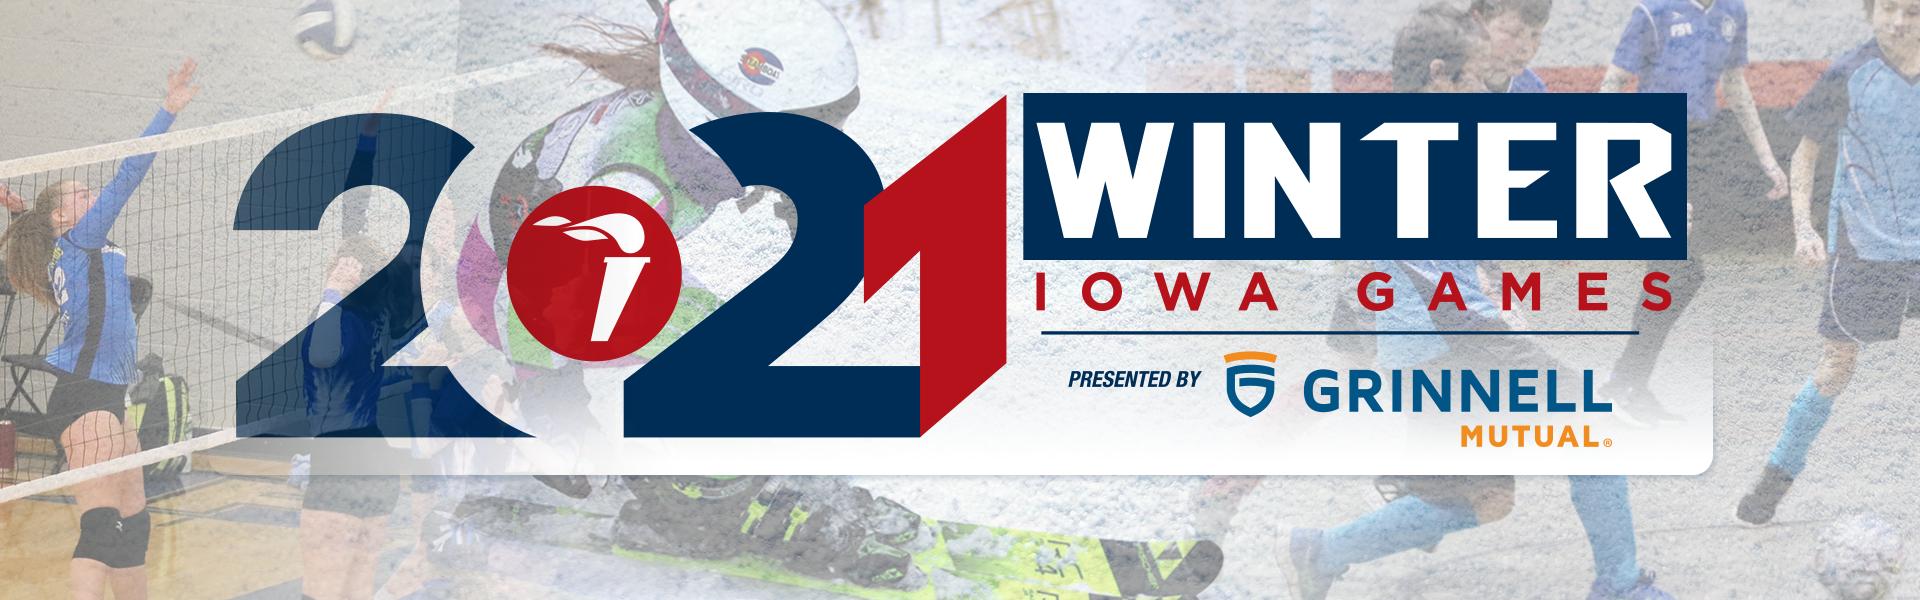 2021 Winter Iowa Games